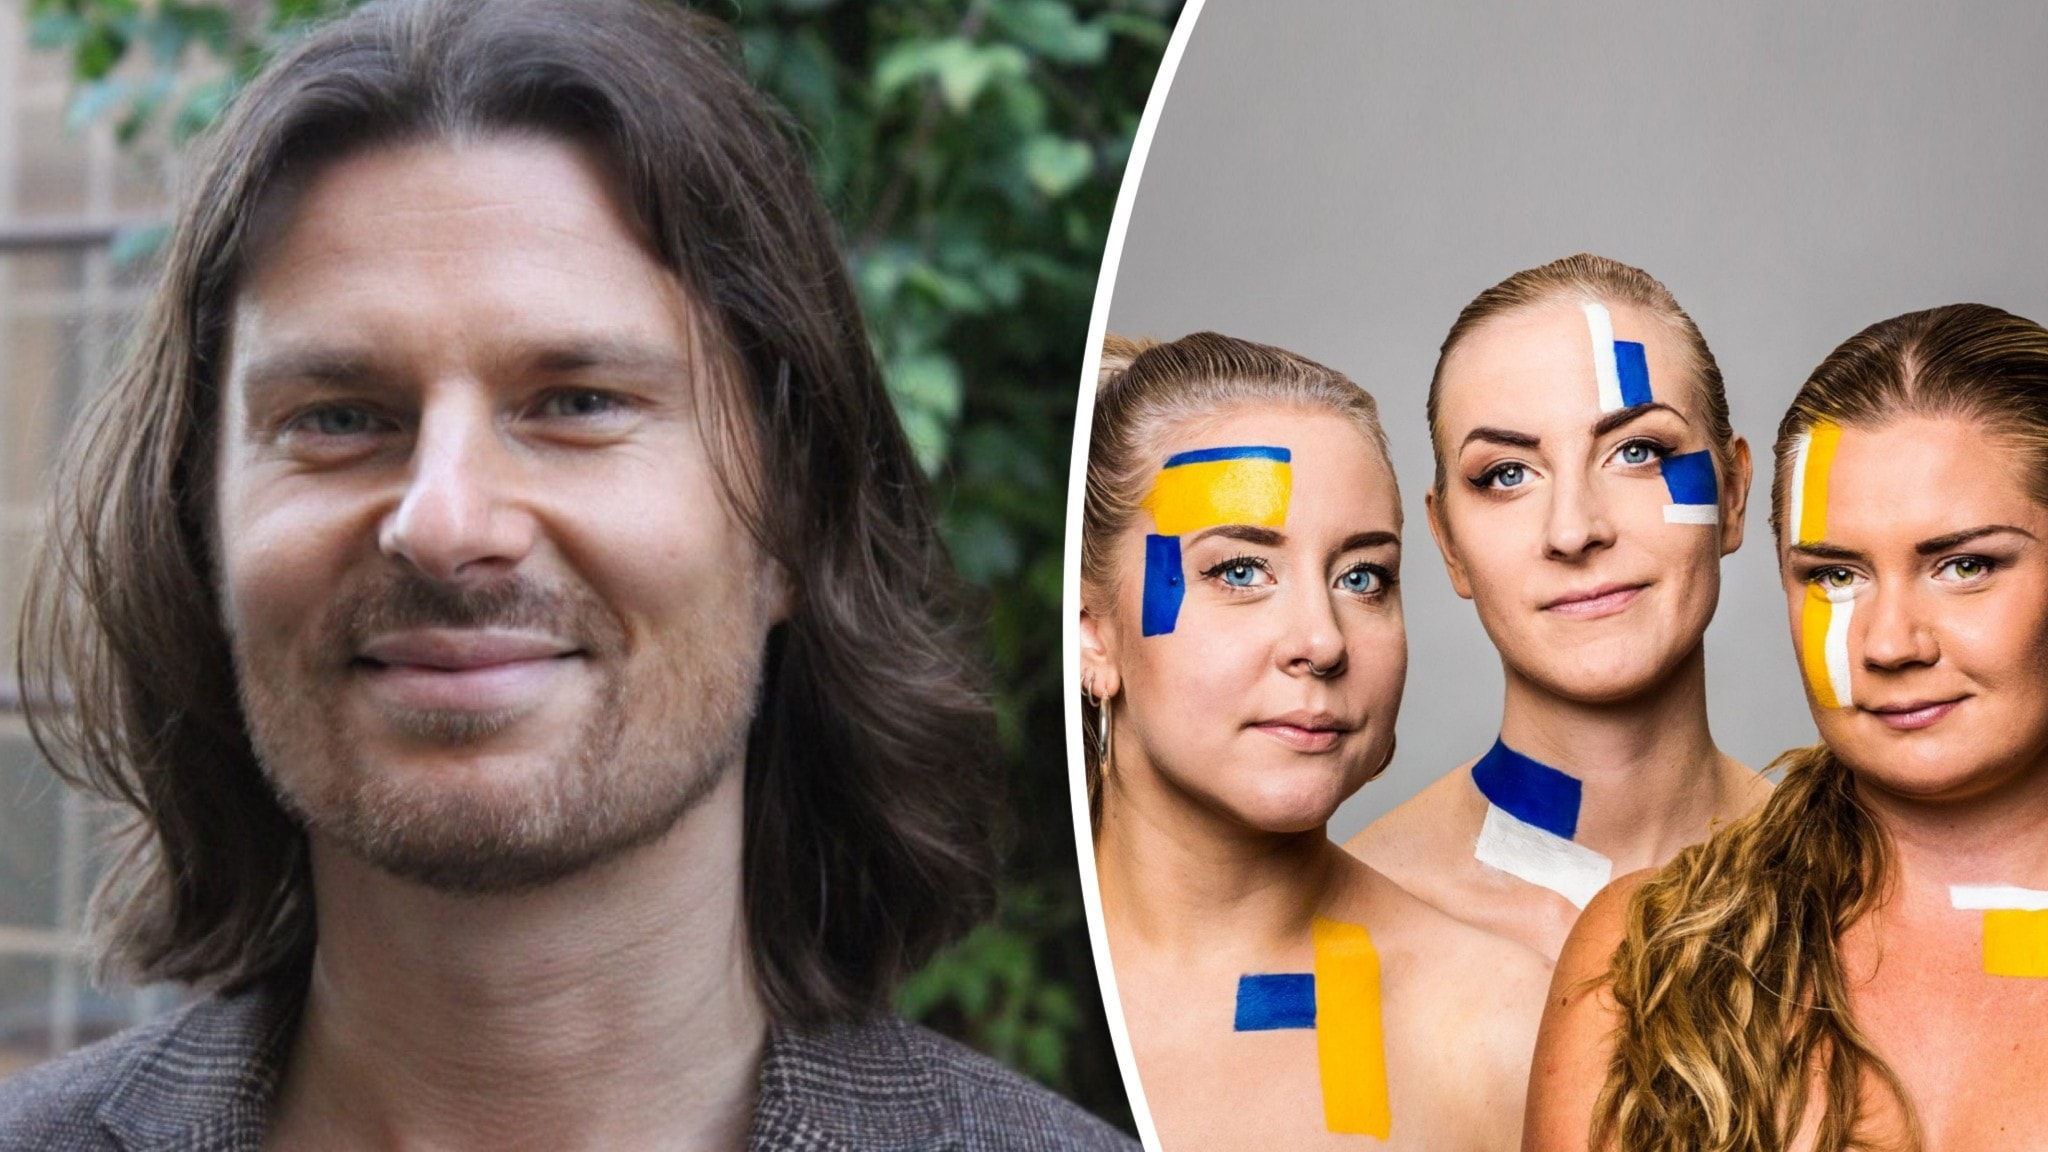 Toni Järlström bredvid Sanna Laakso, Meimi Taipale, Natalie Minnevik.